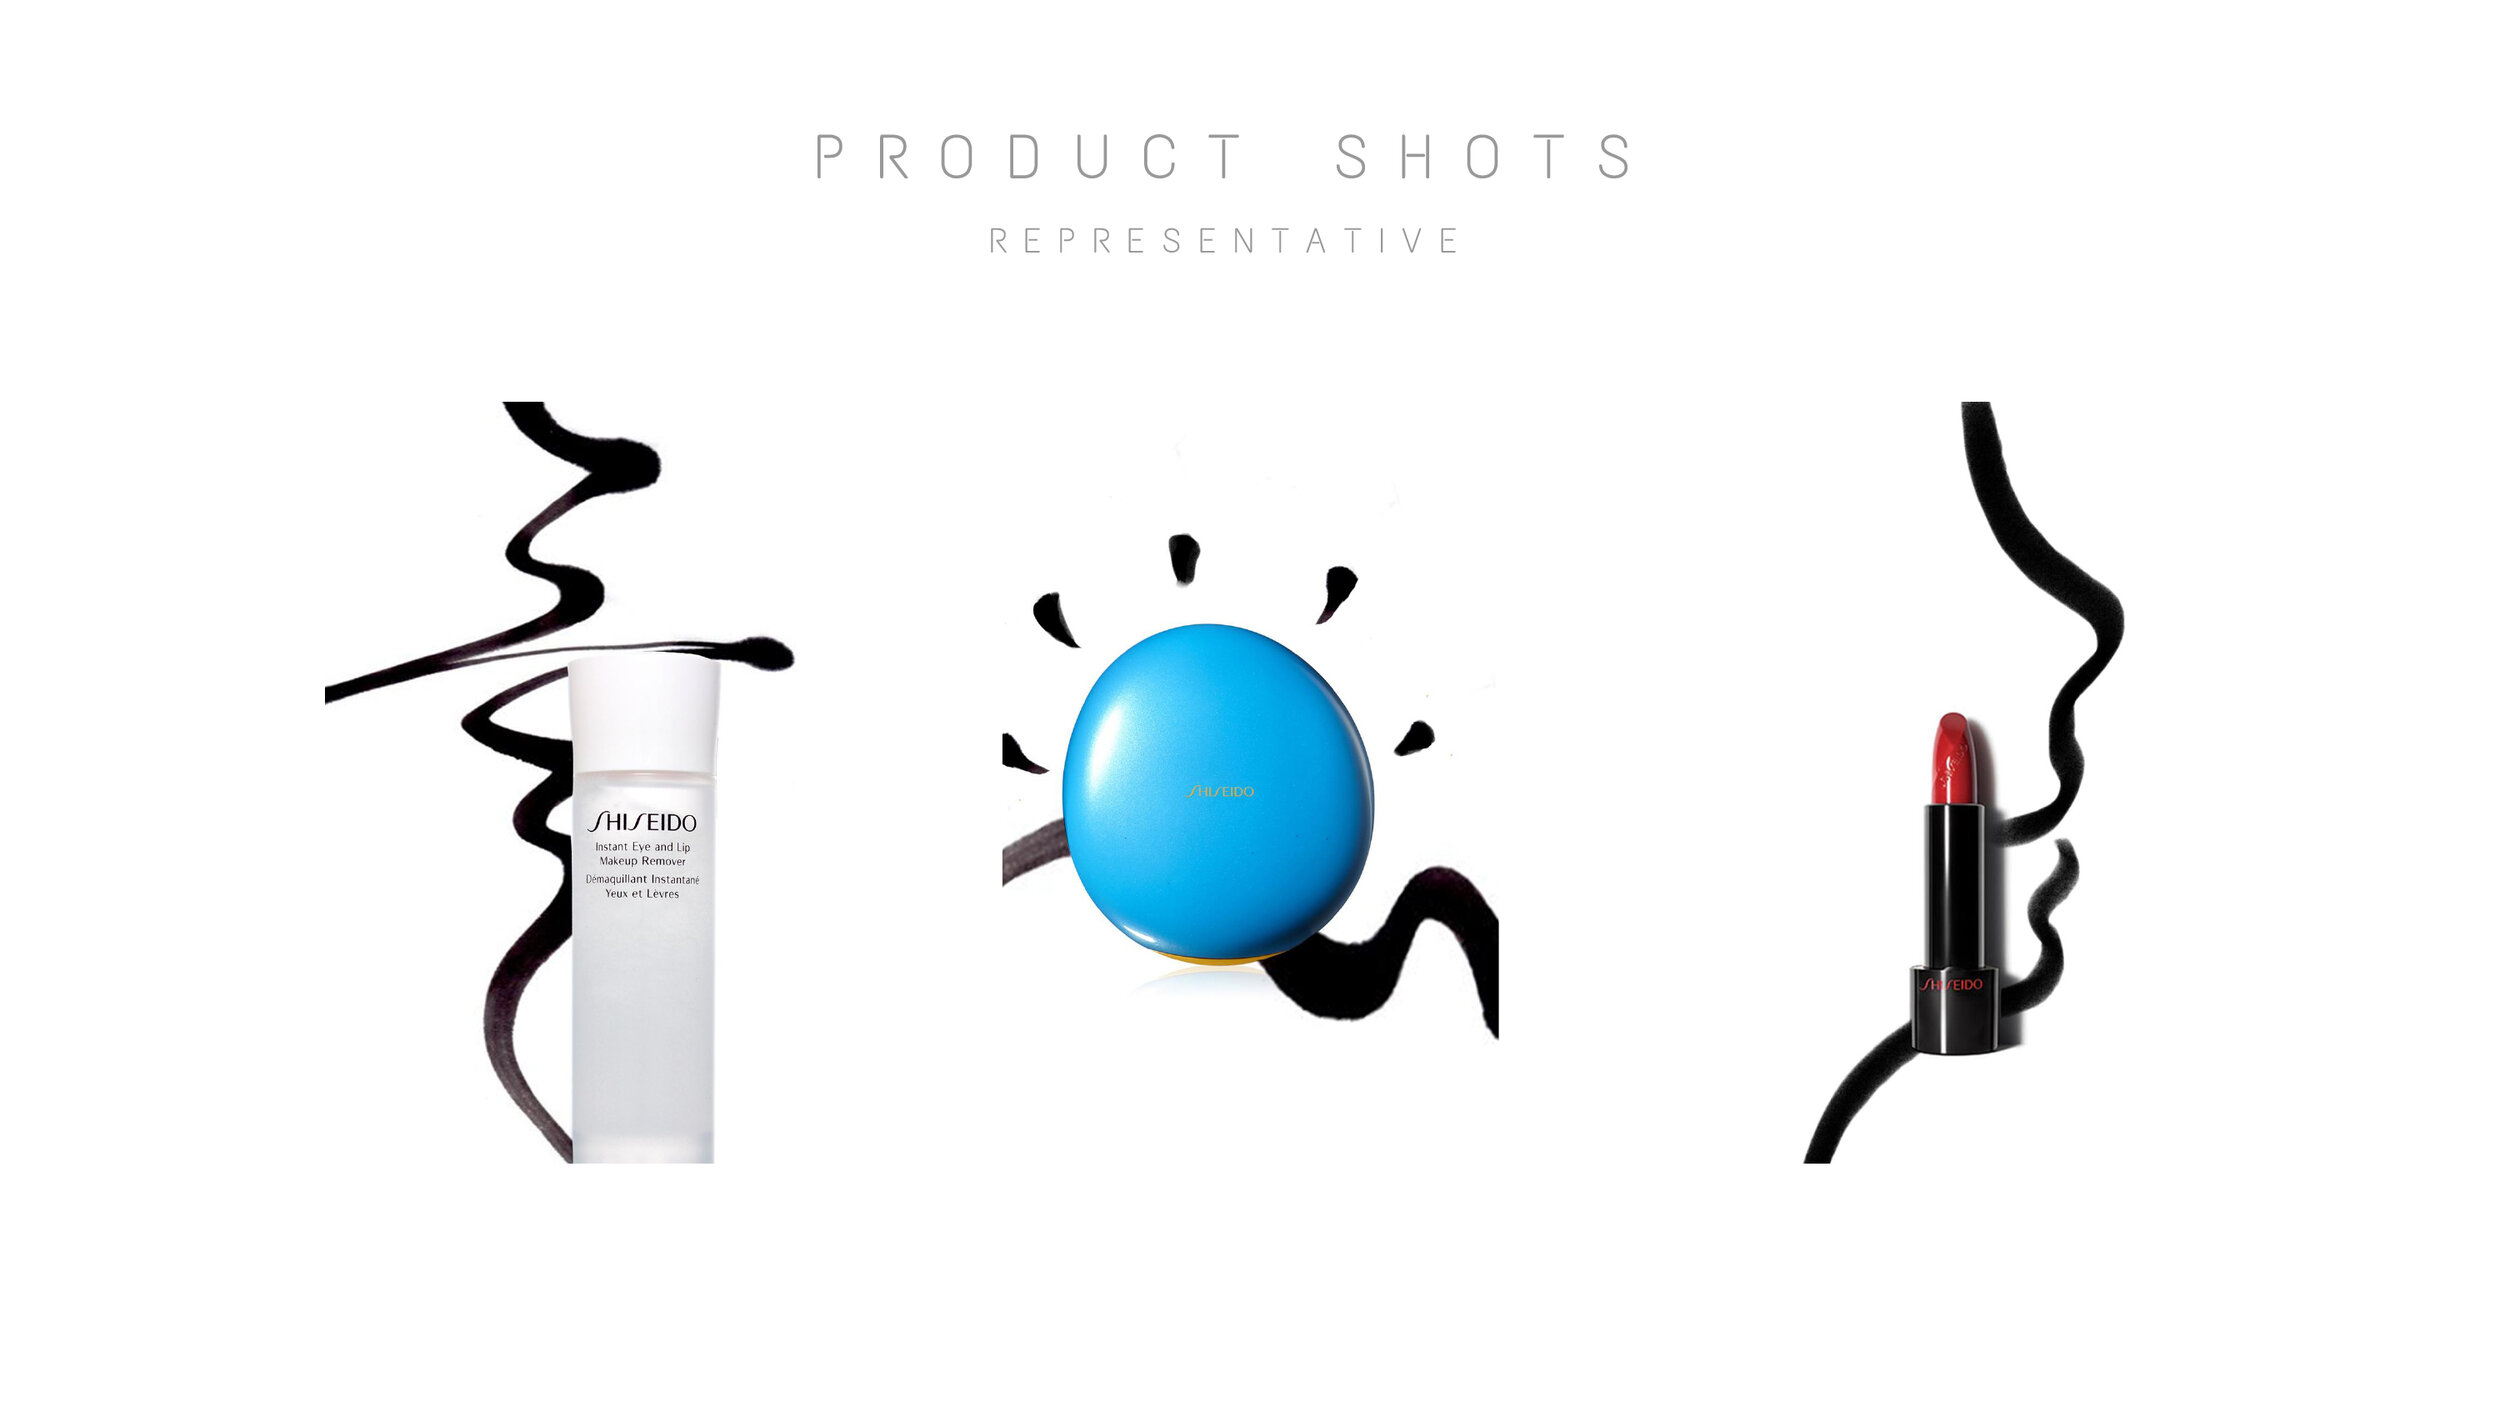 shiseido_brandbook_products2.jpg